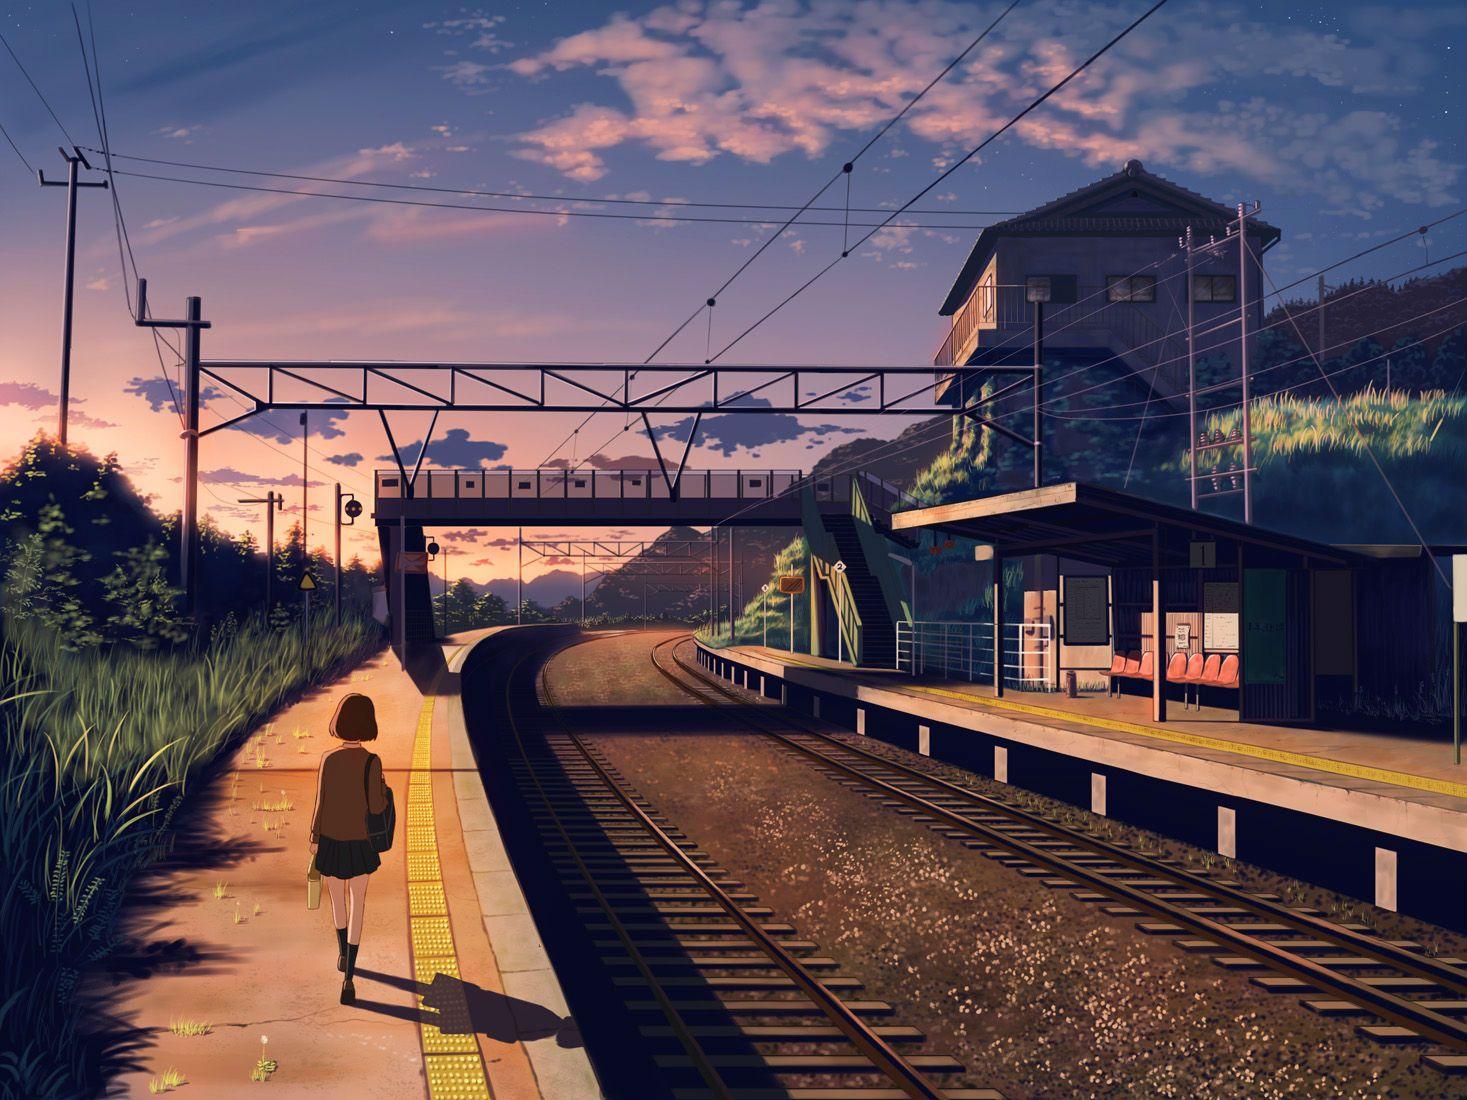 Anime Train Station Scenery